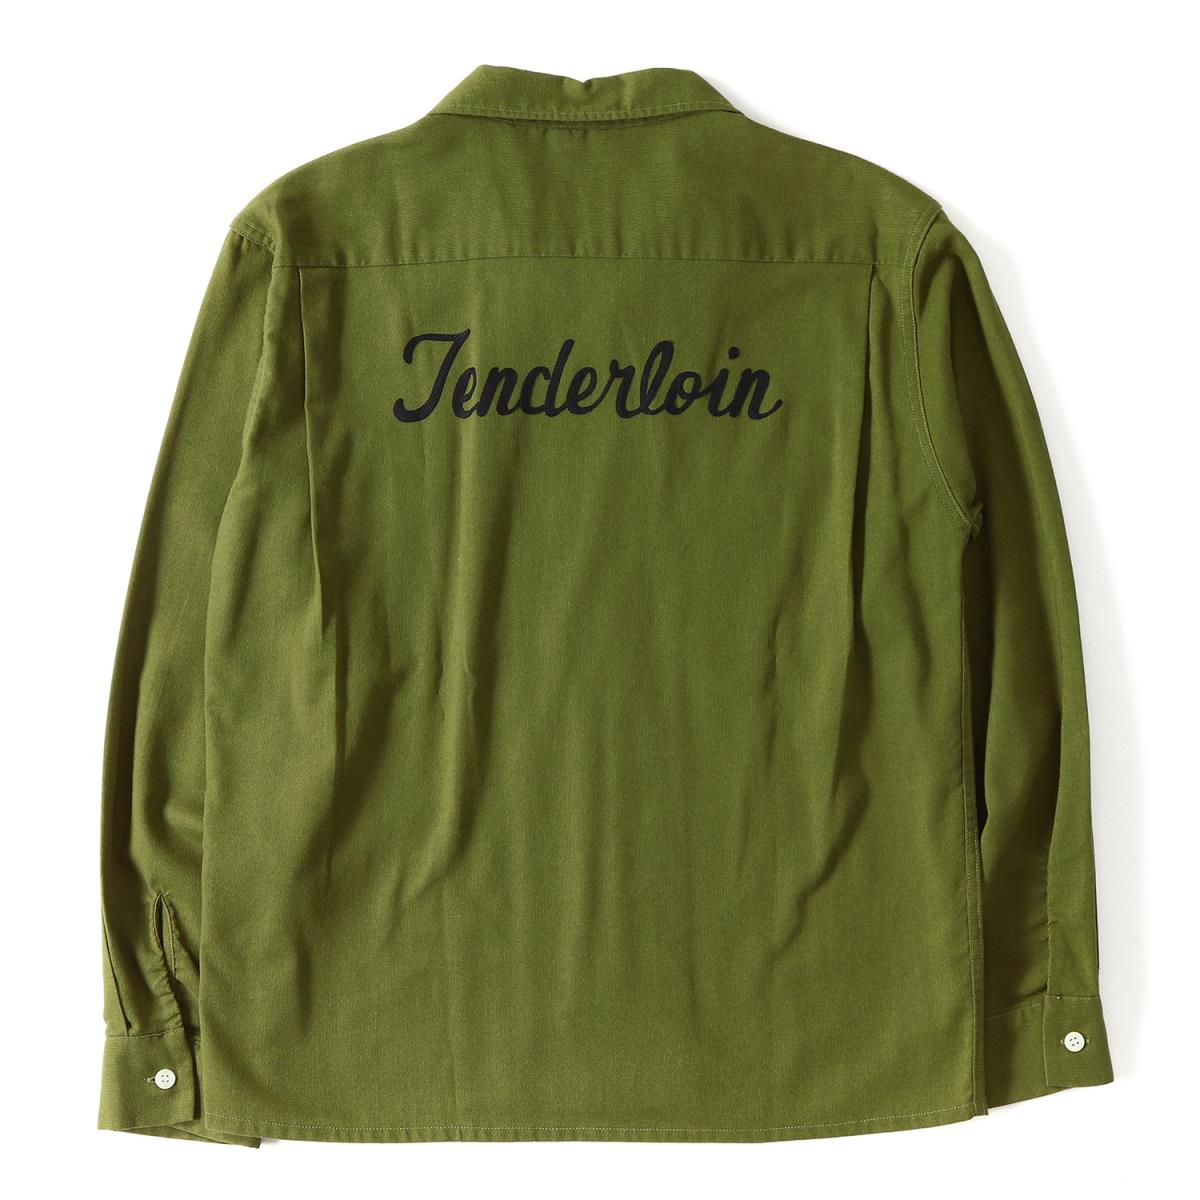 TENDERLOIN (テンダーロイン) ブランドロゴ刺繍ボーリングシャツ(T-BOWL SHT LONG) オリーブ S 【メンズ】【美品】【K2238】【中古】【あす楽☆対応可】